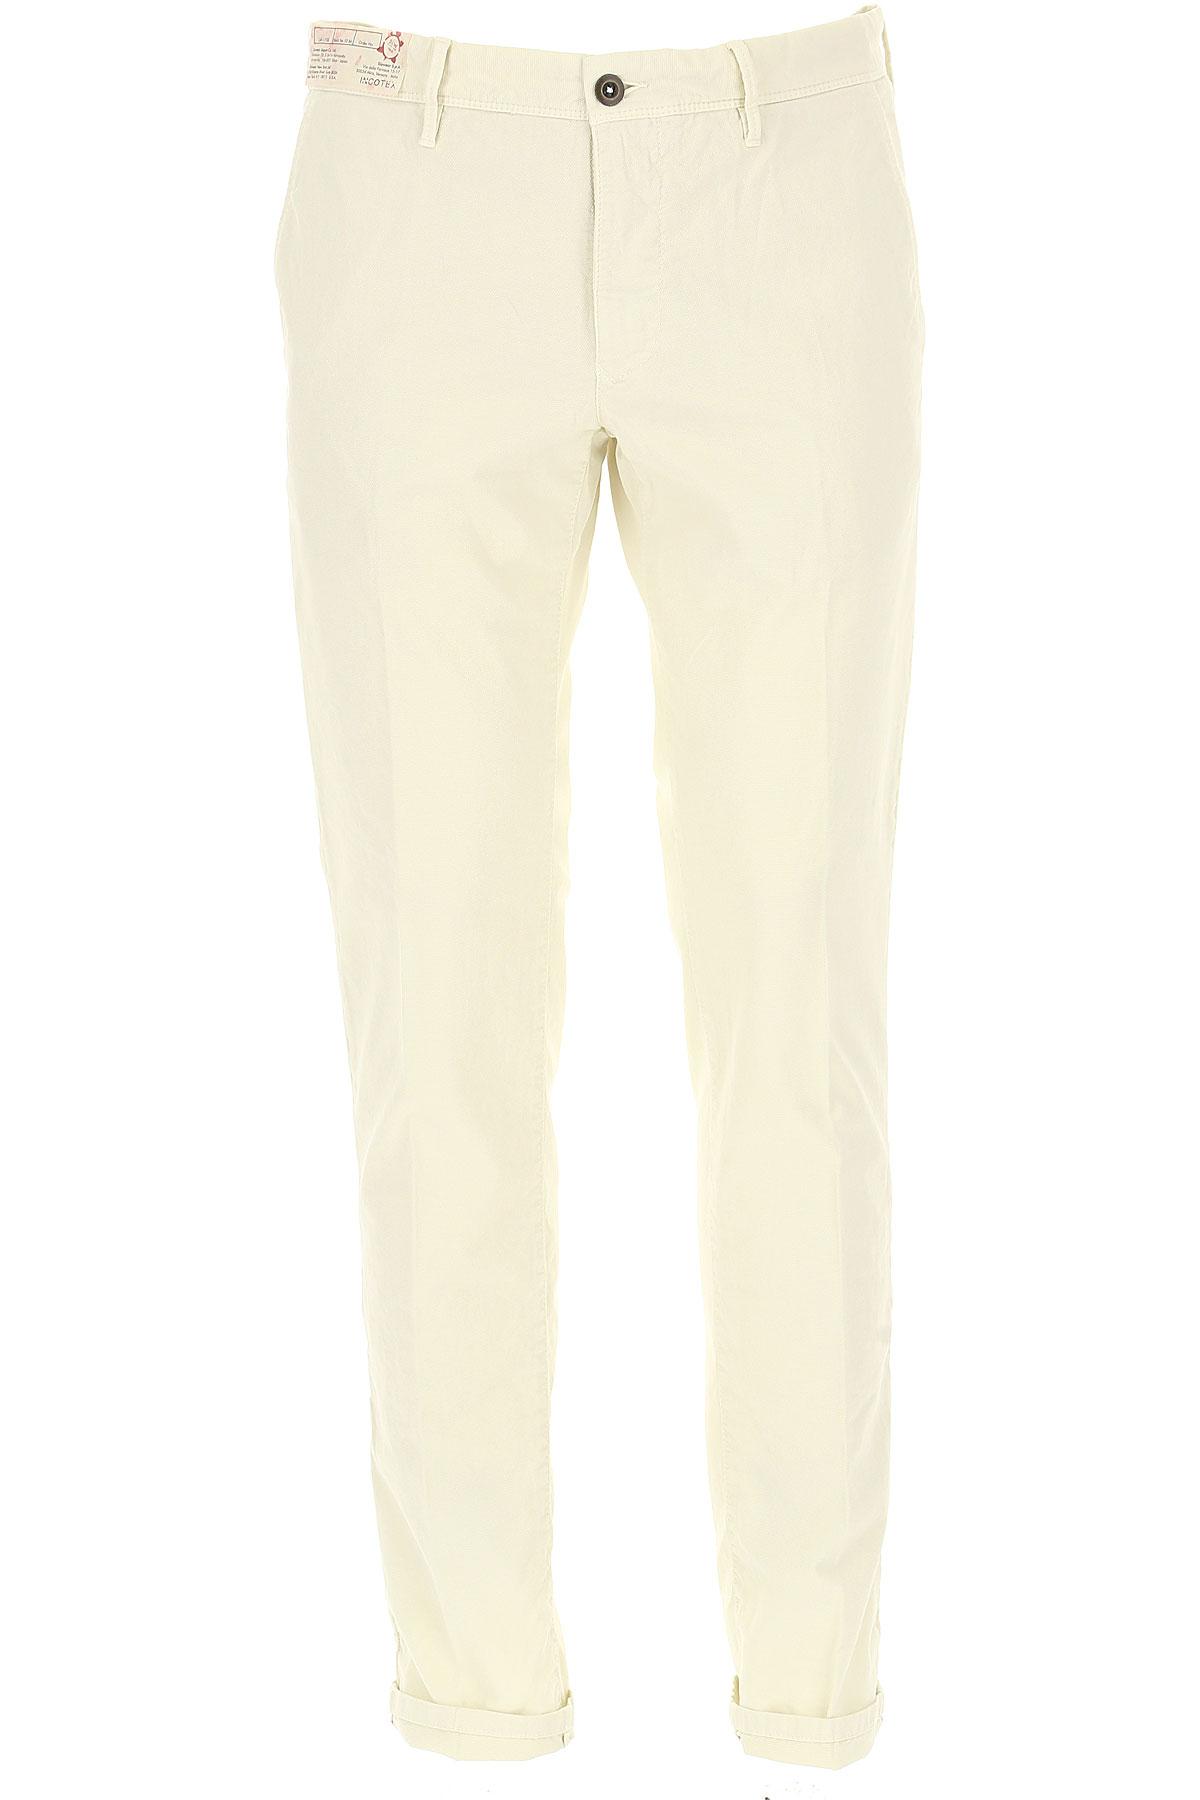 Incotex Pants for Men On Sale, White, Cotton, 2019, 31 32 34 36